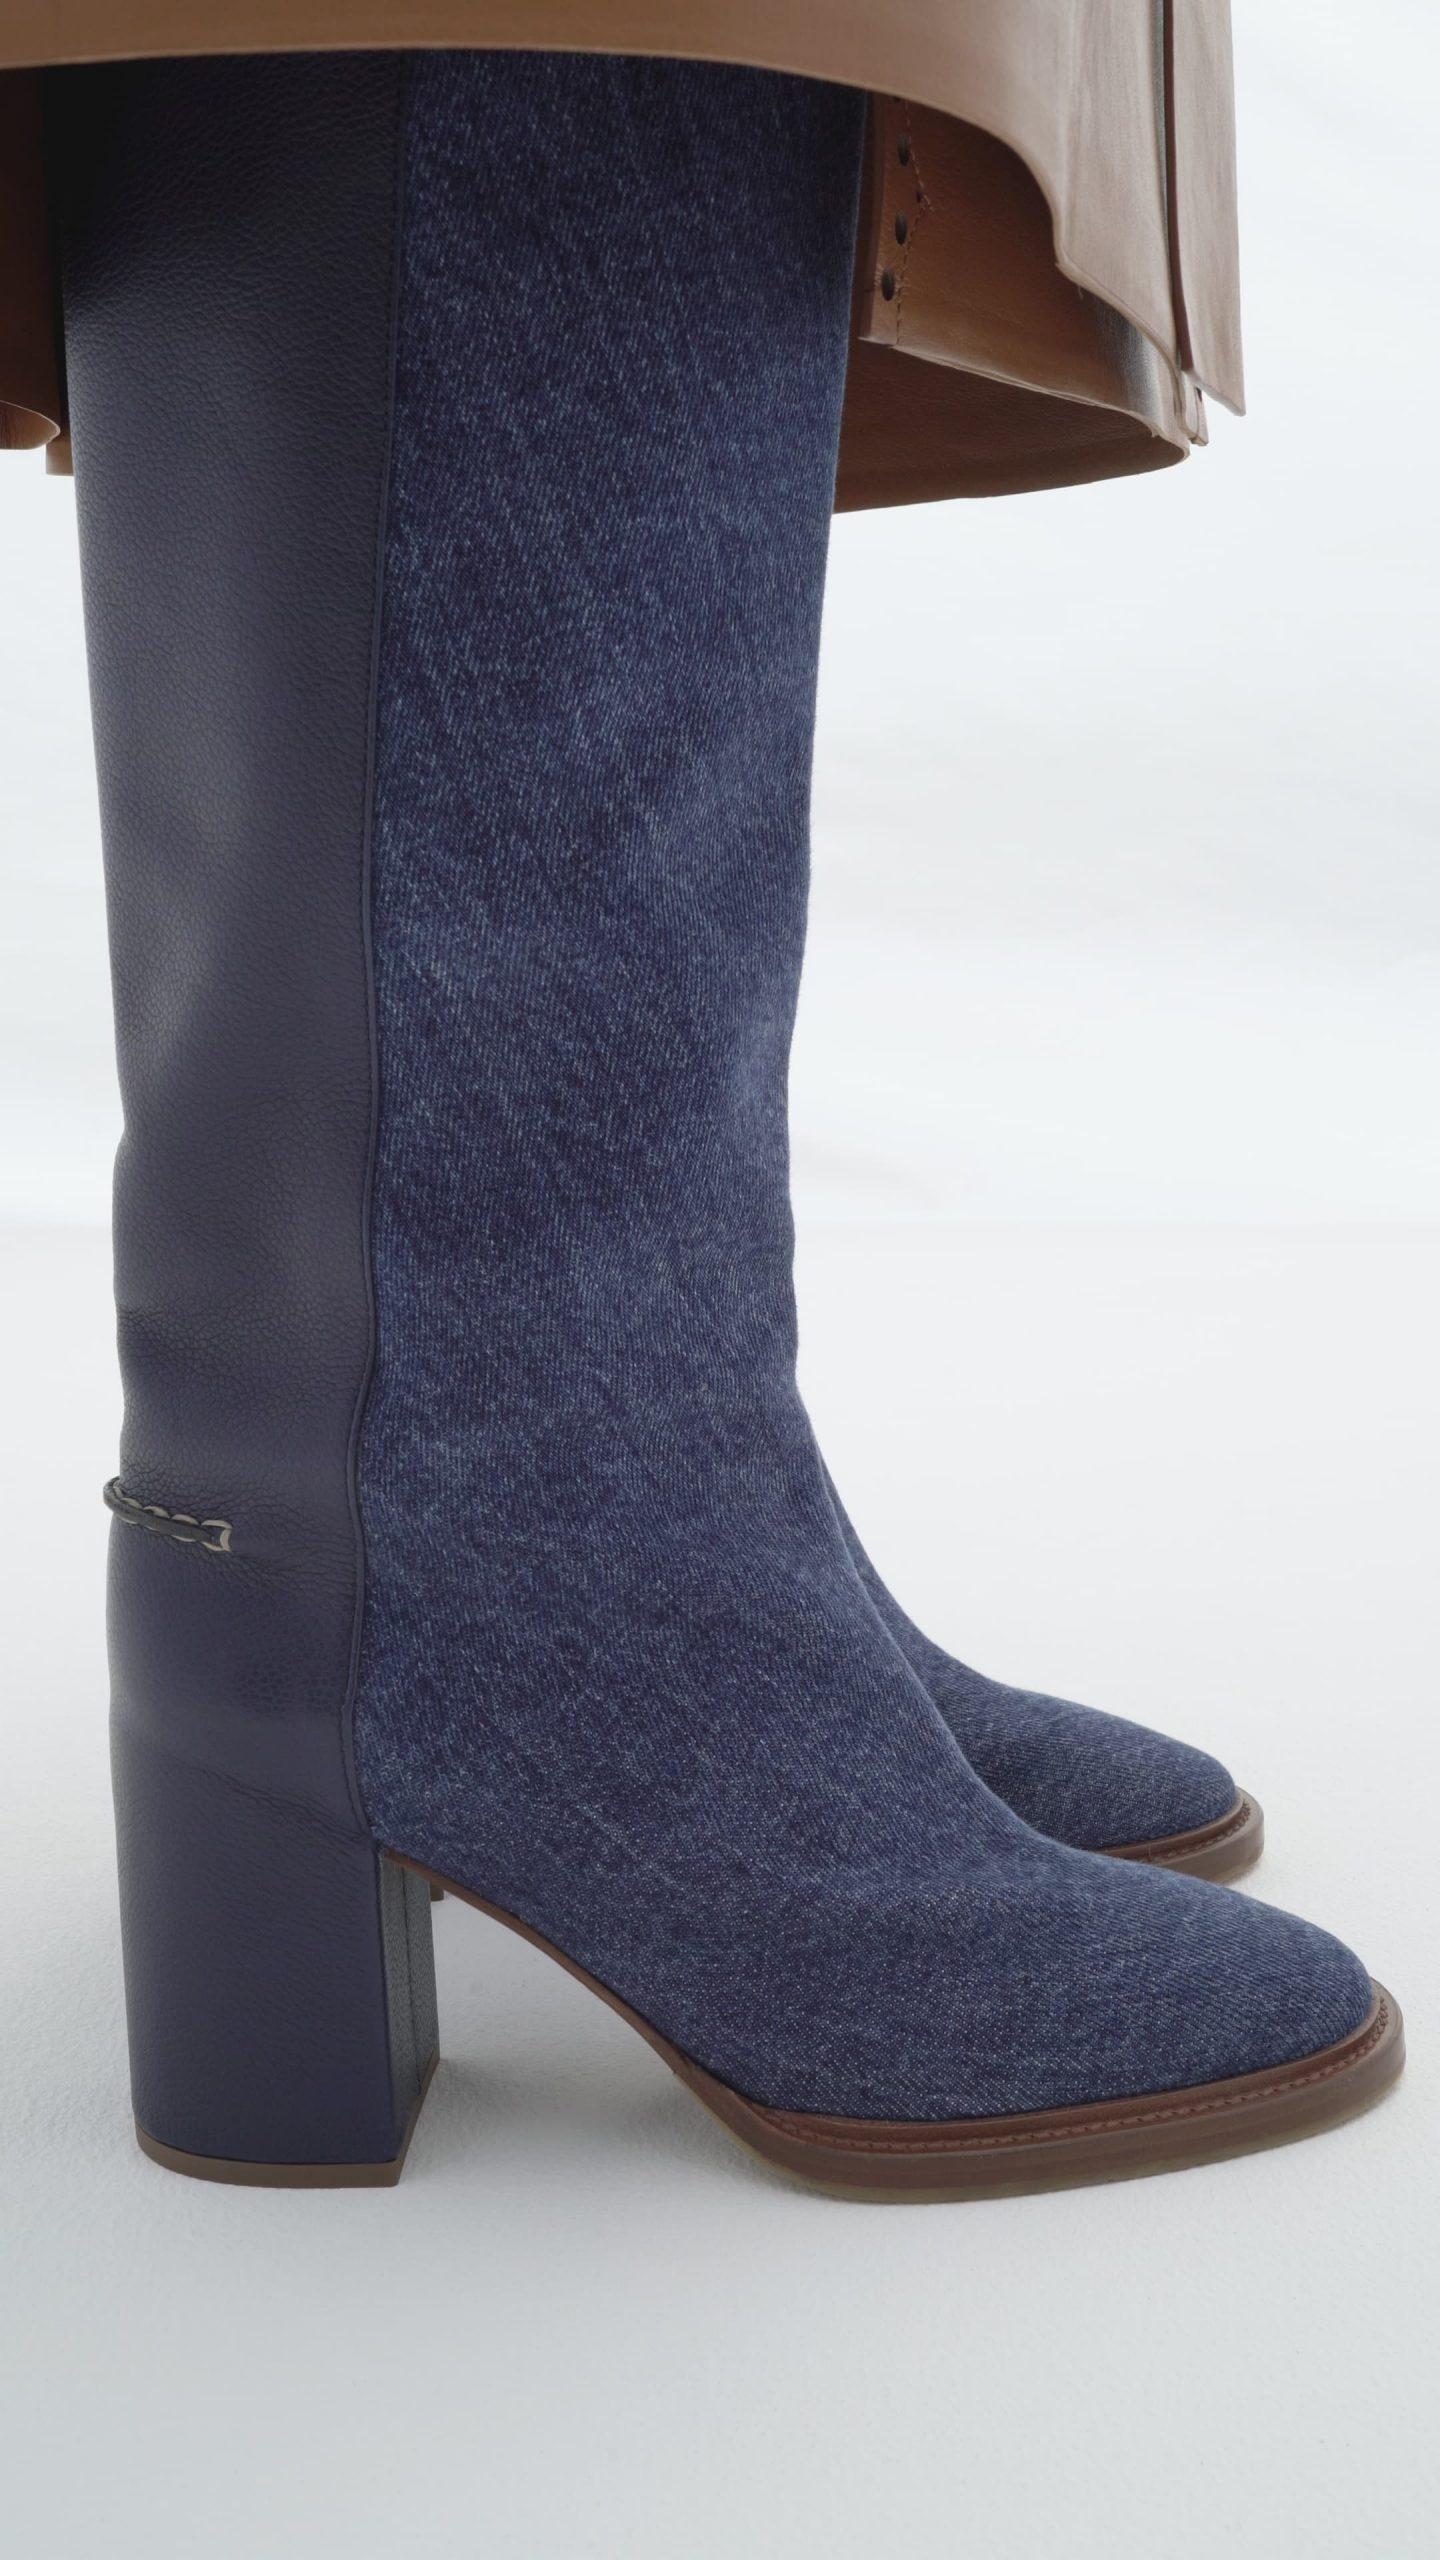 Chloé Resort 2022 Fashion Show Details